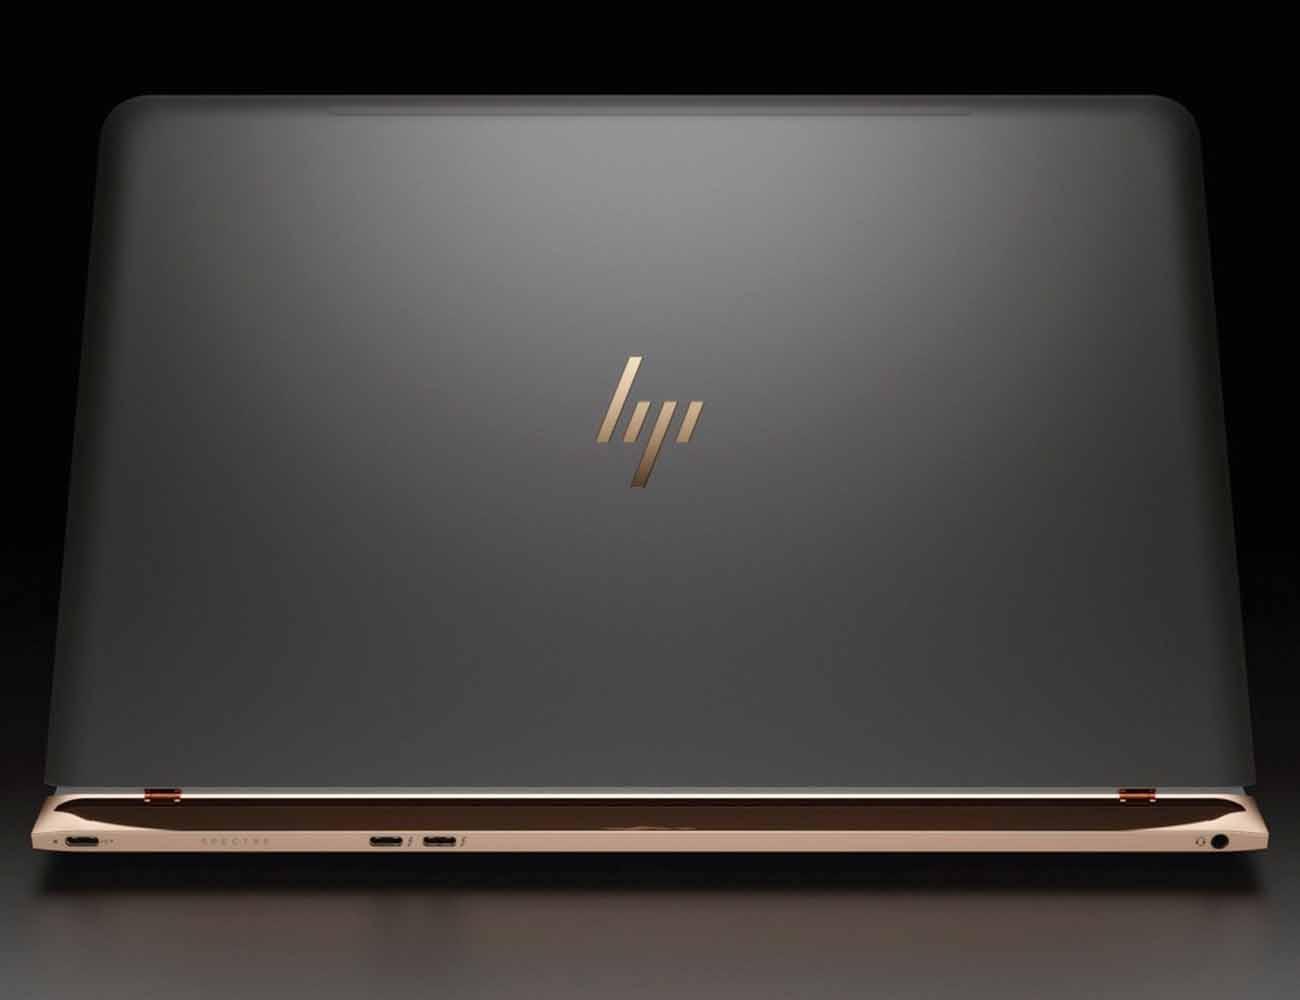 HP Spectre – The World's Thinnest Laptop